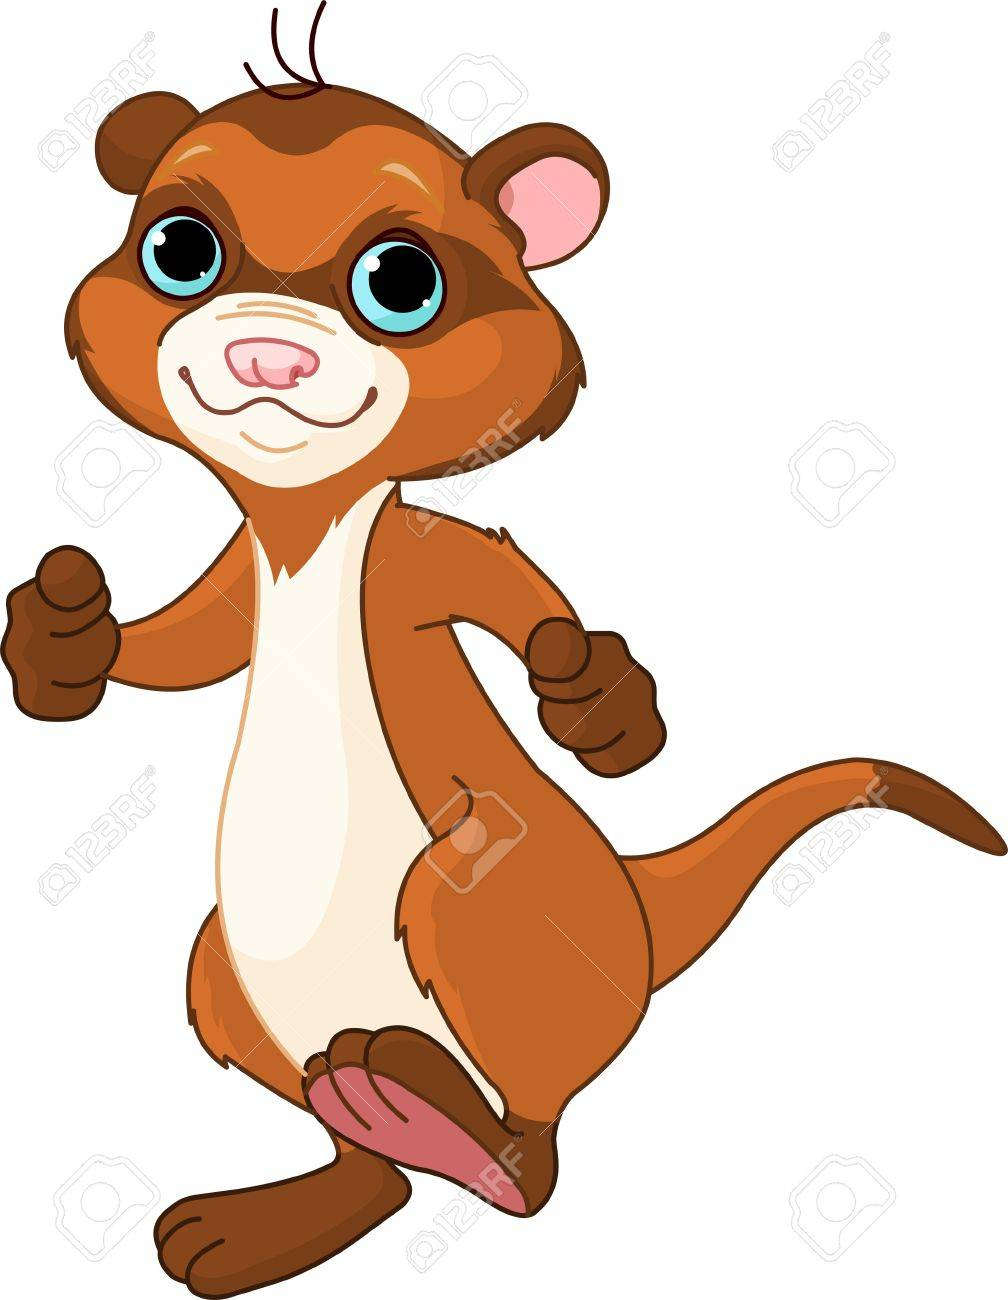 889 ferret cliparts stock vector and royalty free ferret illustrations rh 123rf com ferret clip art images ferret clipart